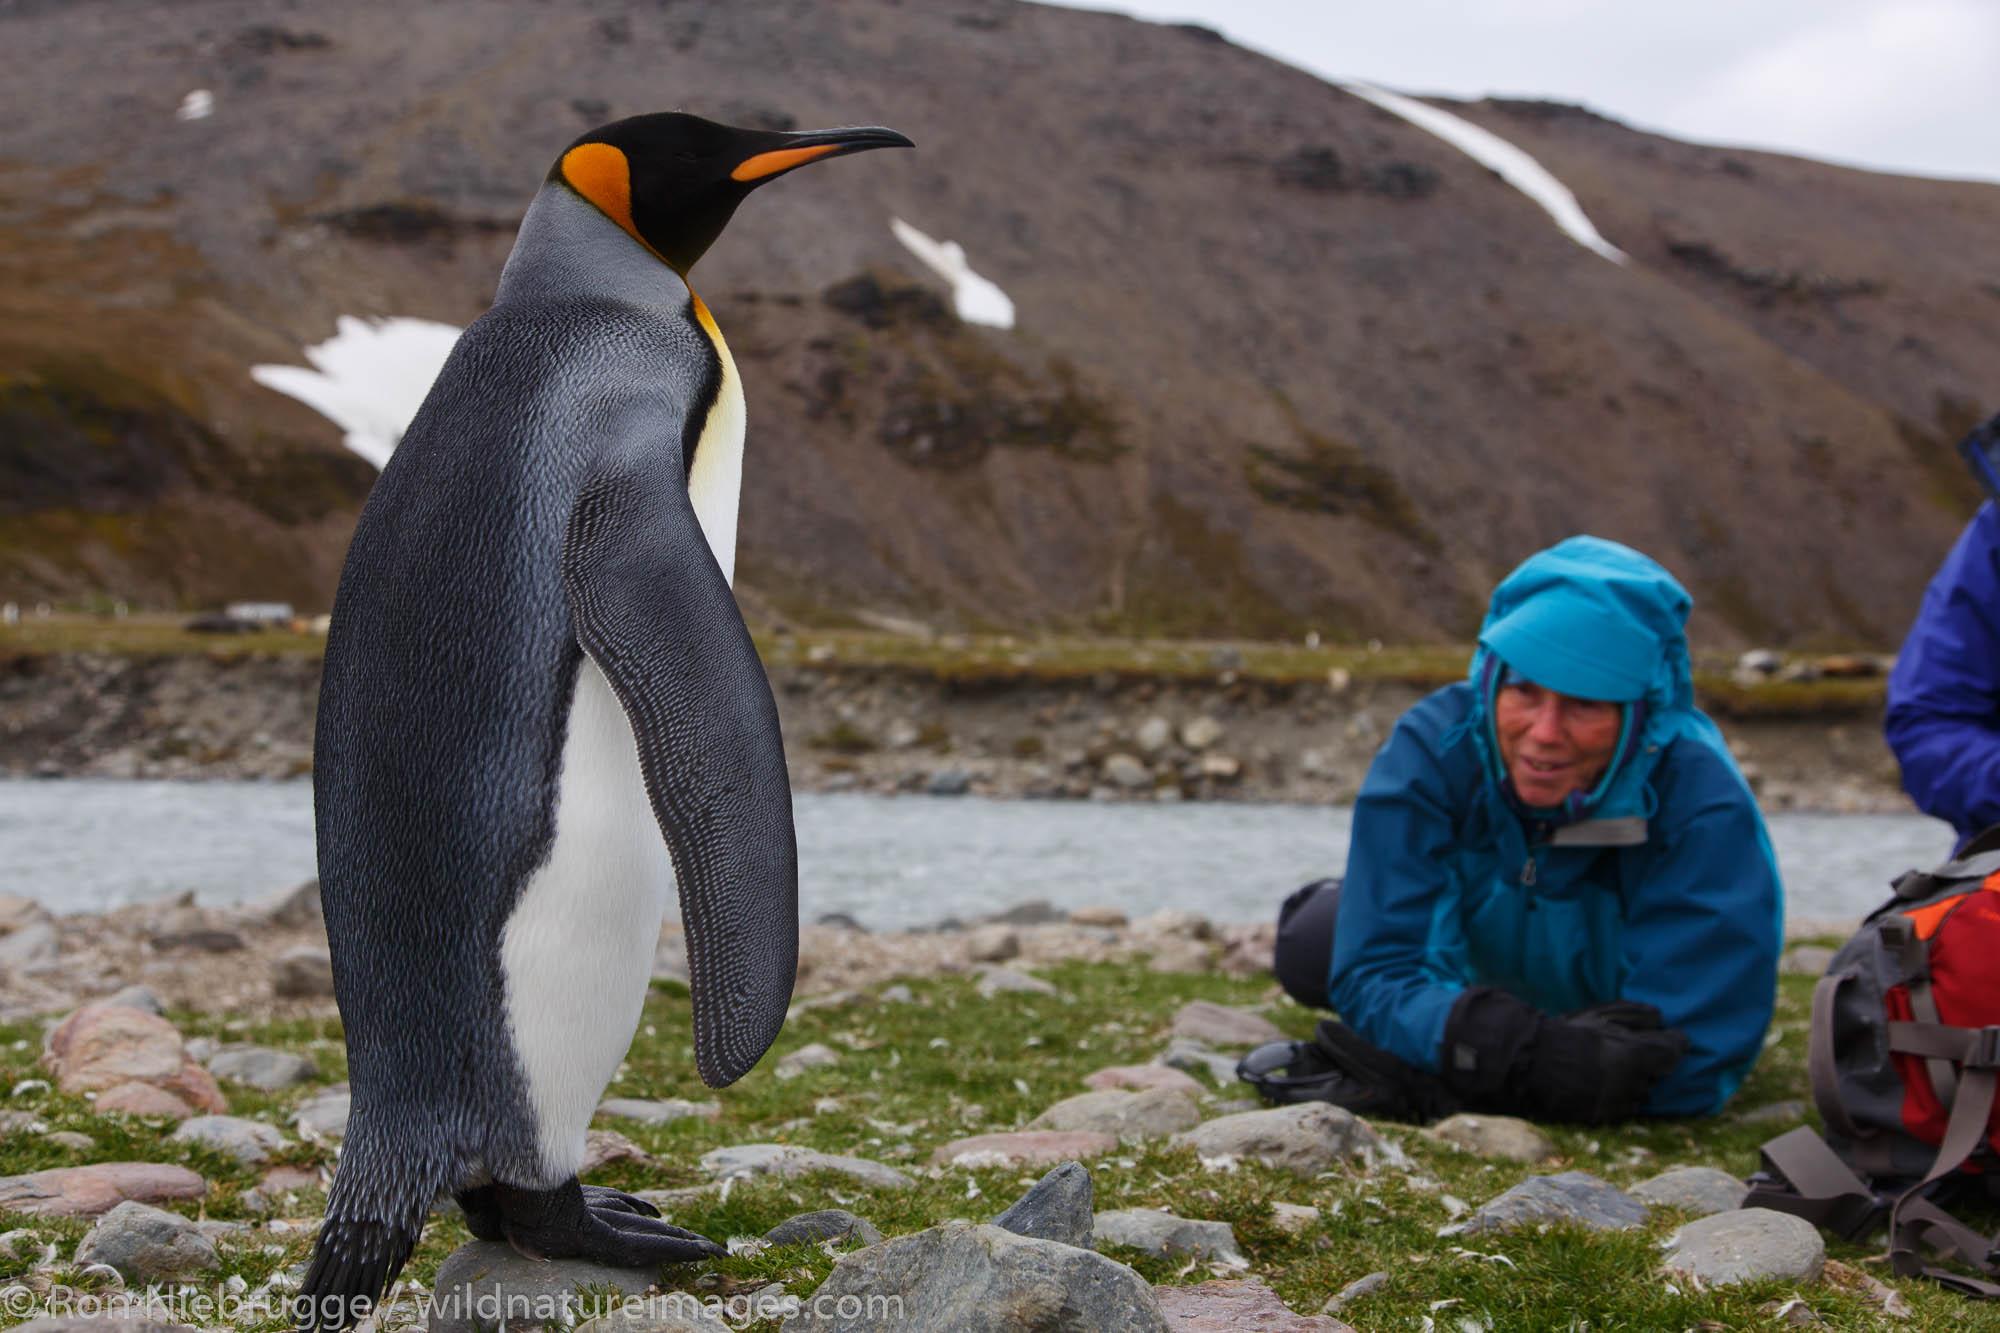 Visitors interact with King penguins (Aptenodytes patagonicus), Saint Andrews Bay, South Georgia, Antarctica.